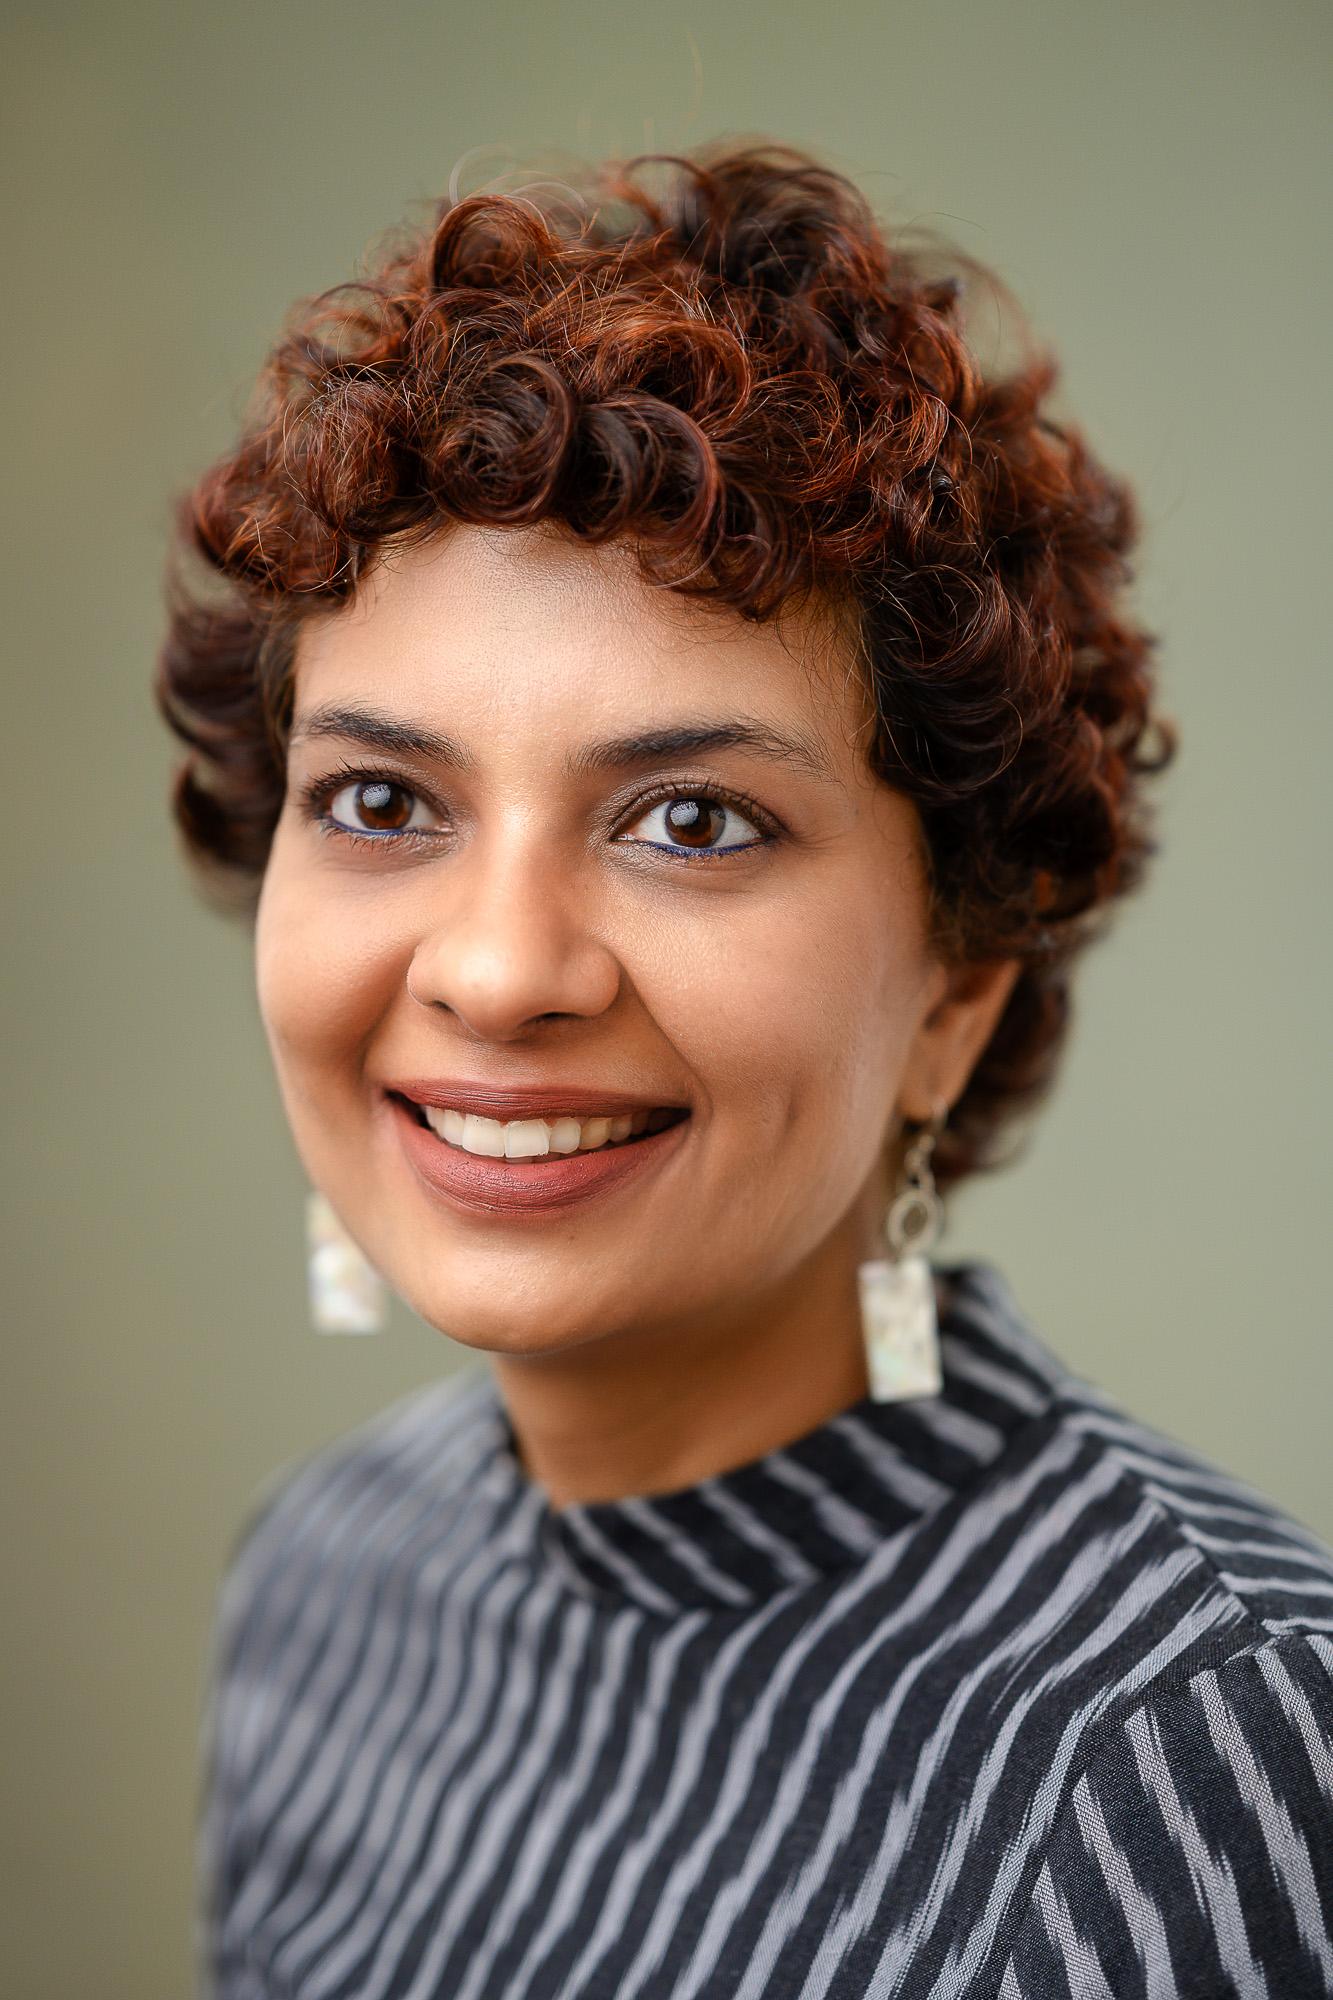 Neeta-Shankar-Photography-Headshot-Portrait-Photographer-contemporary-portraits-of-founder-ceo-AMARKOSA-sustainable-fashion-brand